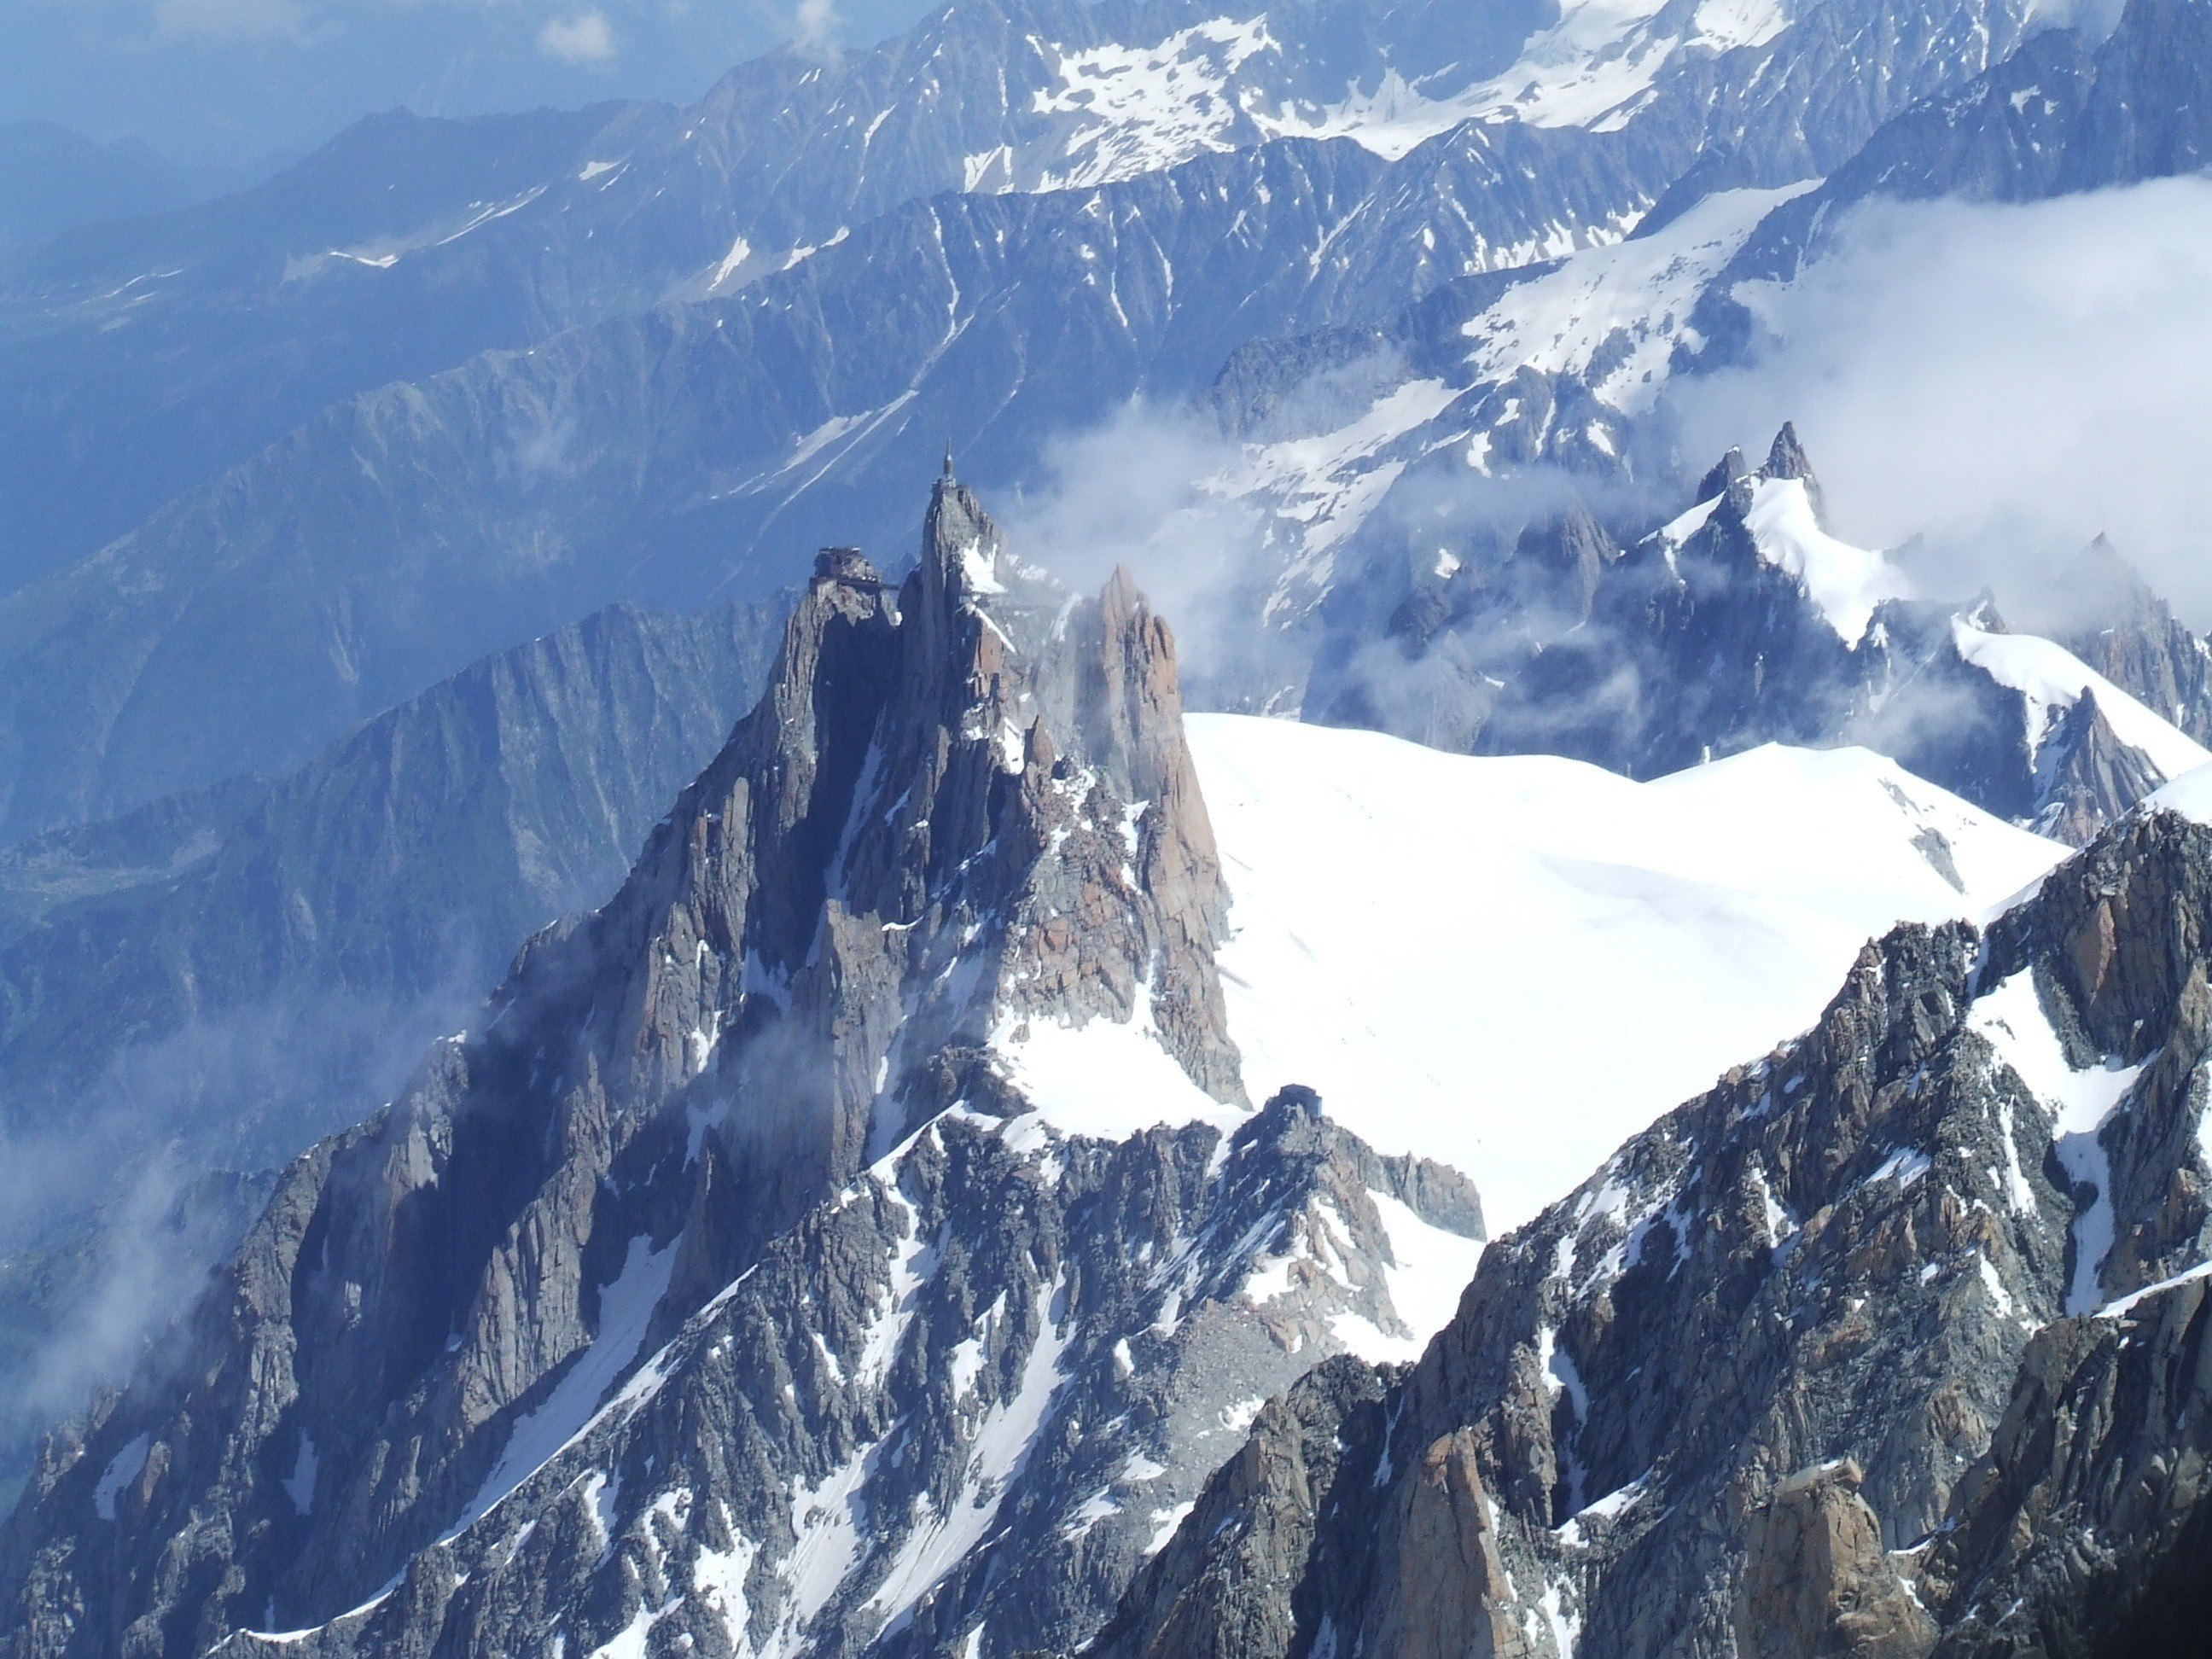 Widok na Aiguille du Midi z podejścia na Mont Blanc